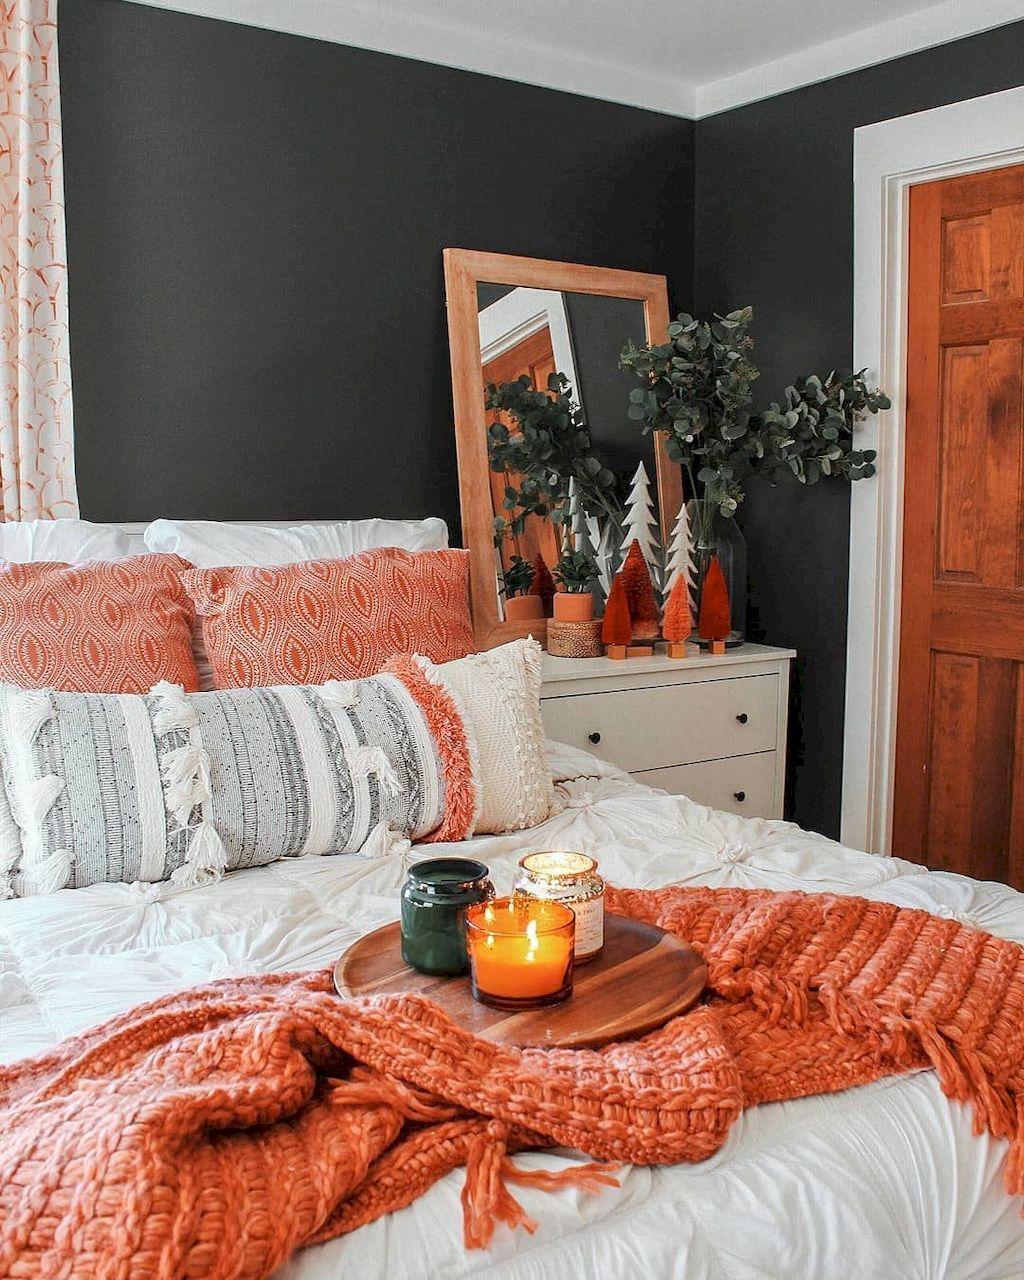 Affordable Decoration Trick For Master Bedroom Elonahome Com Home Decor Apartment Decor Home Bedroom Fresh orange bedroom designs